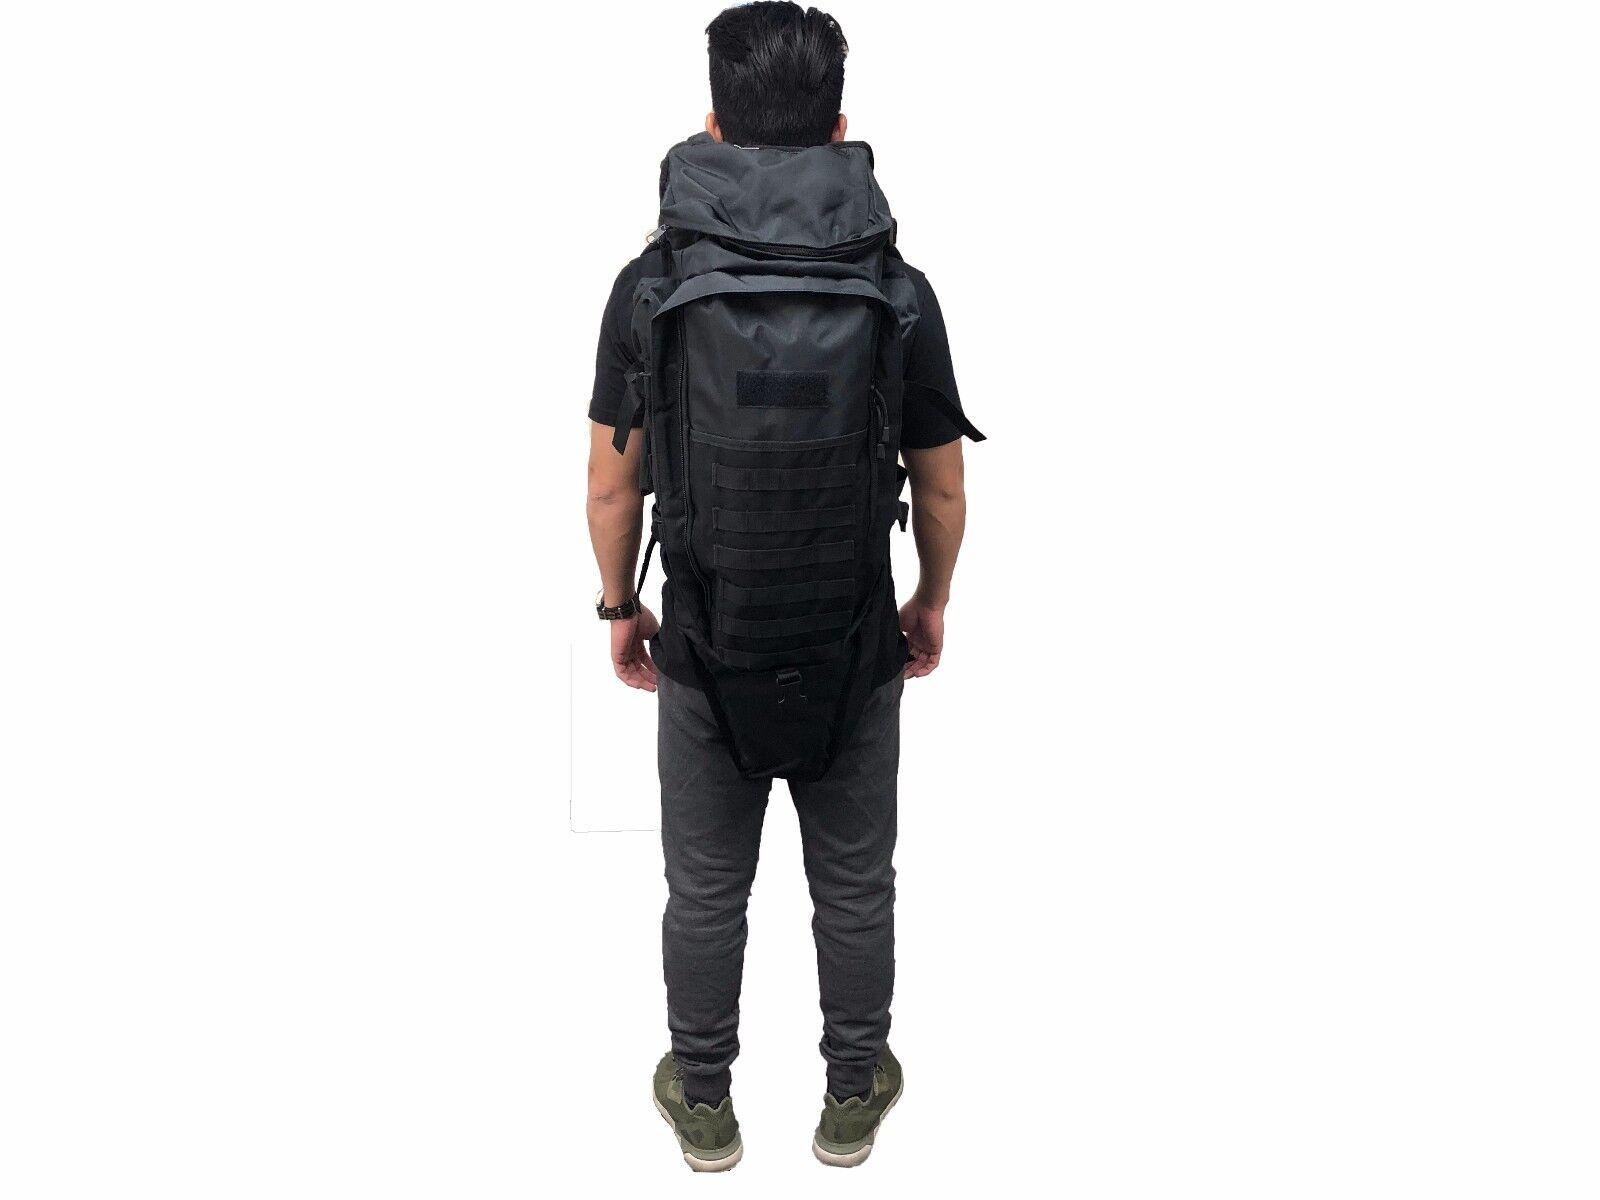 Tactical Backpack Black Rifle Gun Holder Trekking Hiking Bag